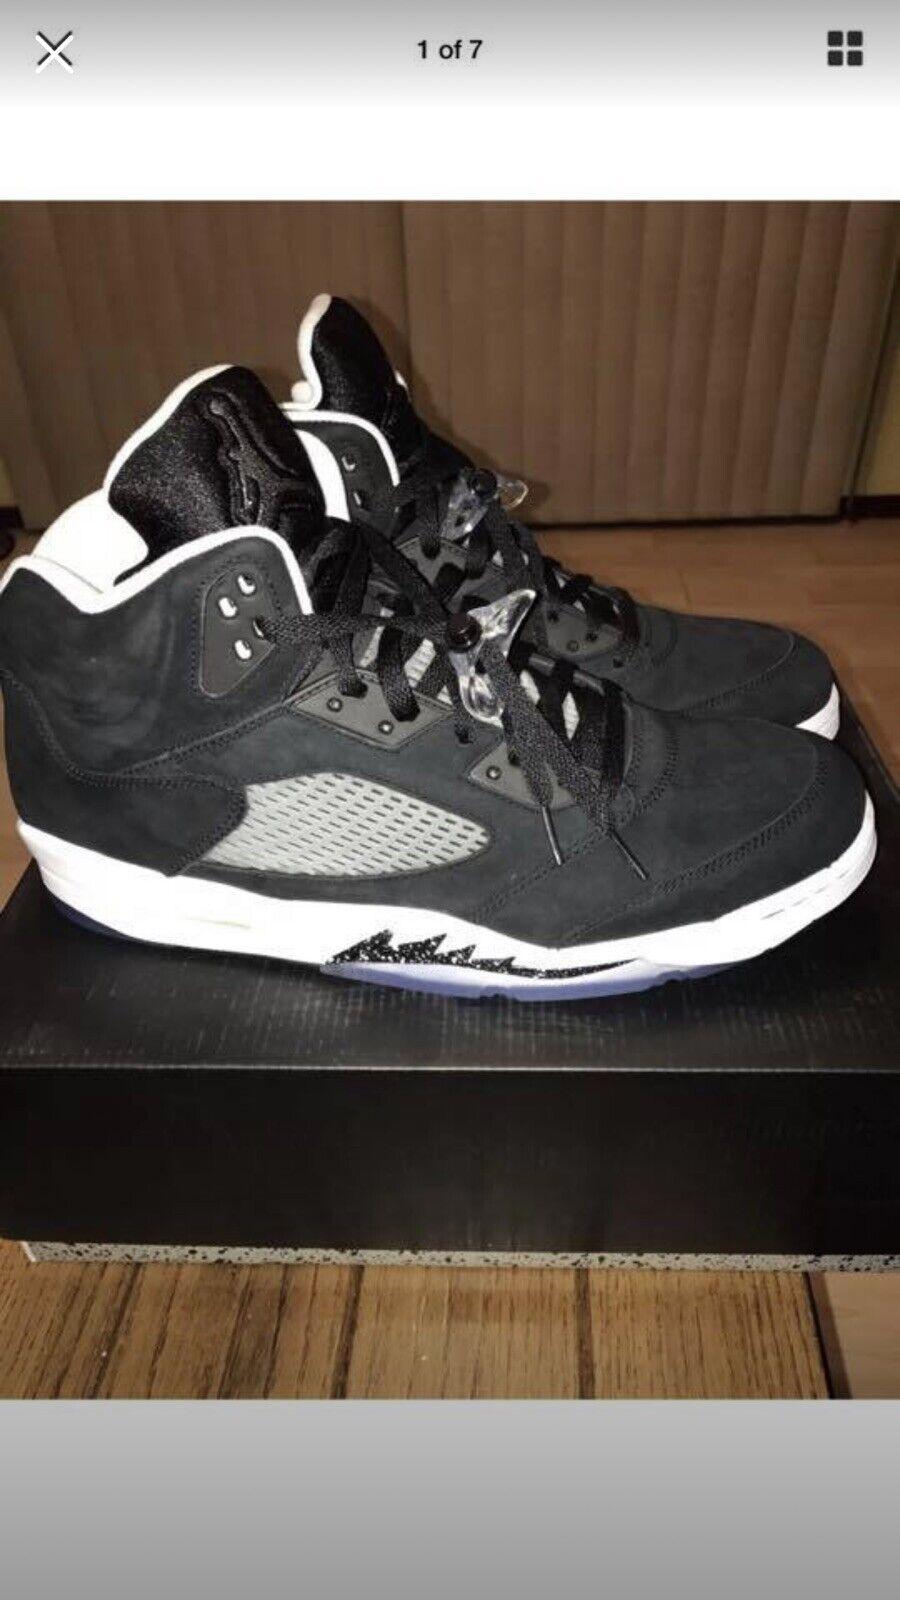 acf320bdddee Nike Air Jordan Retro 5 Oreo Dead Stock. Brand New. Sz 14